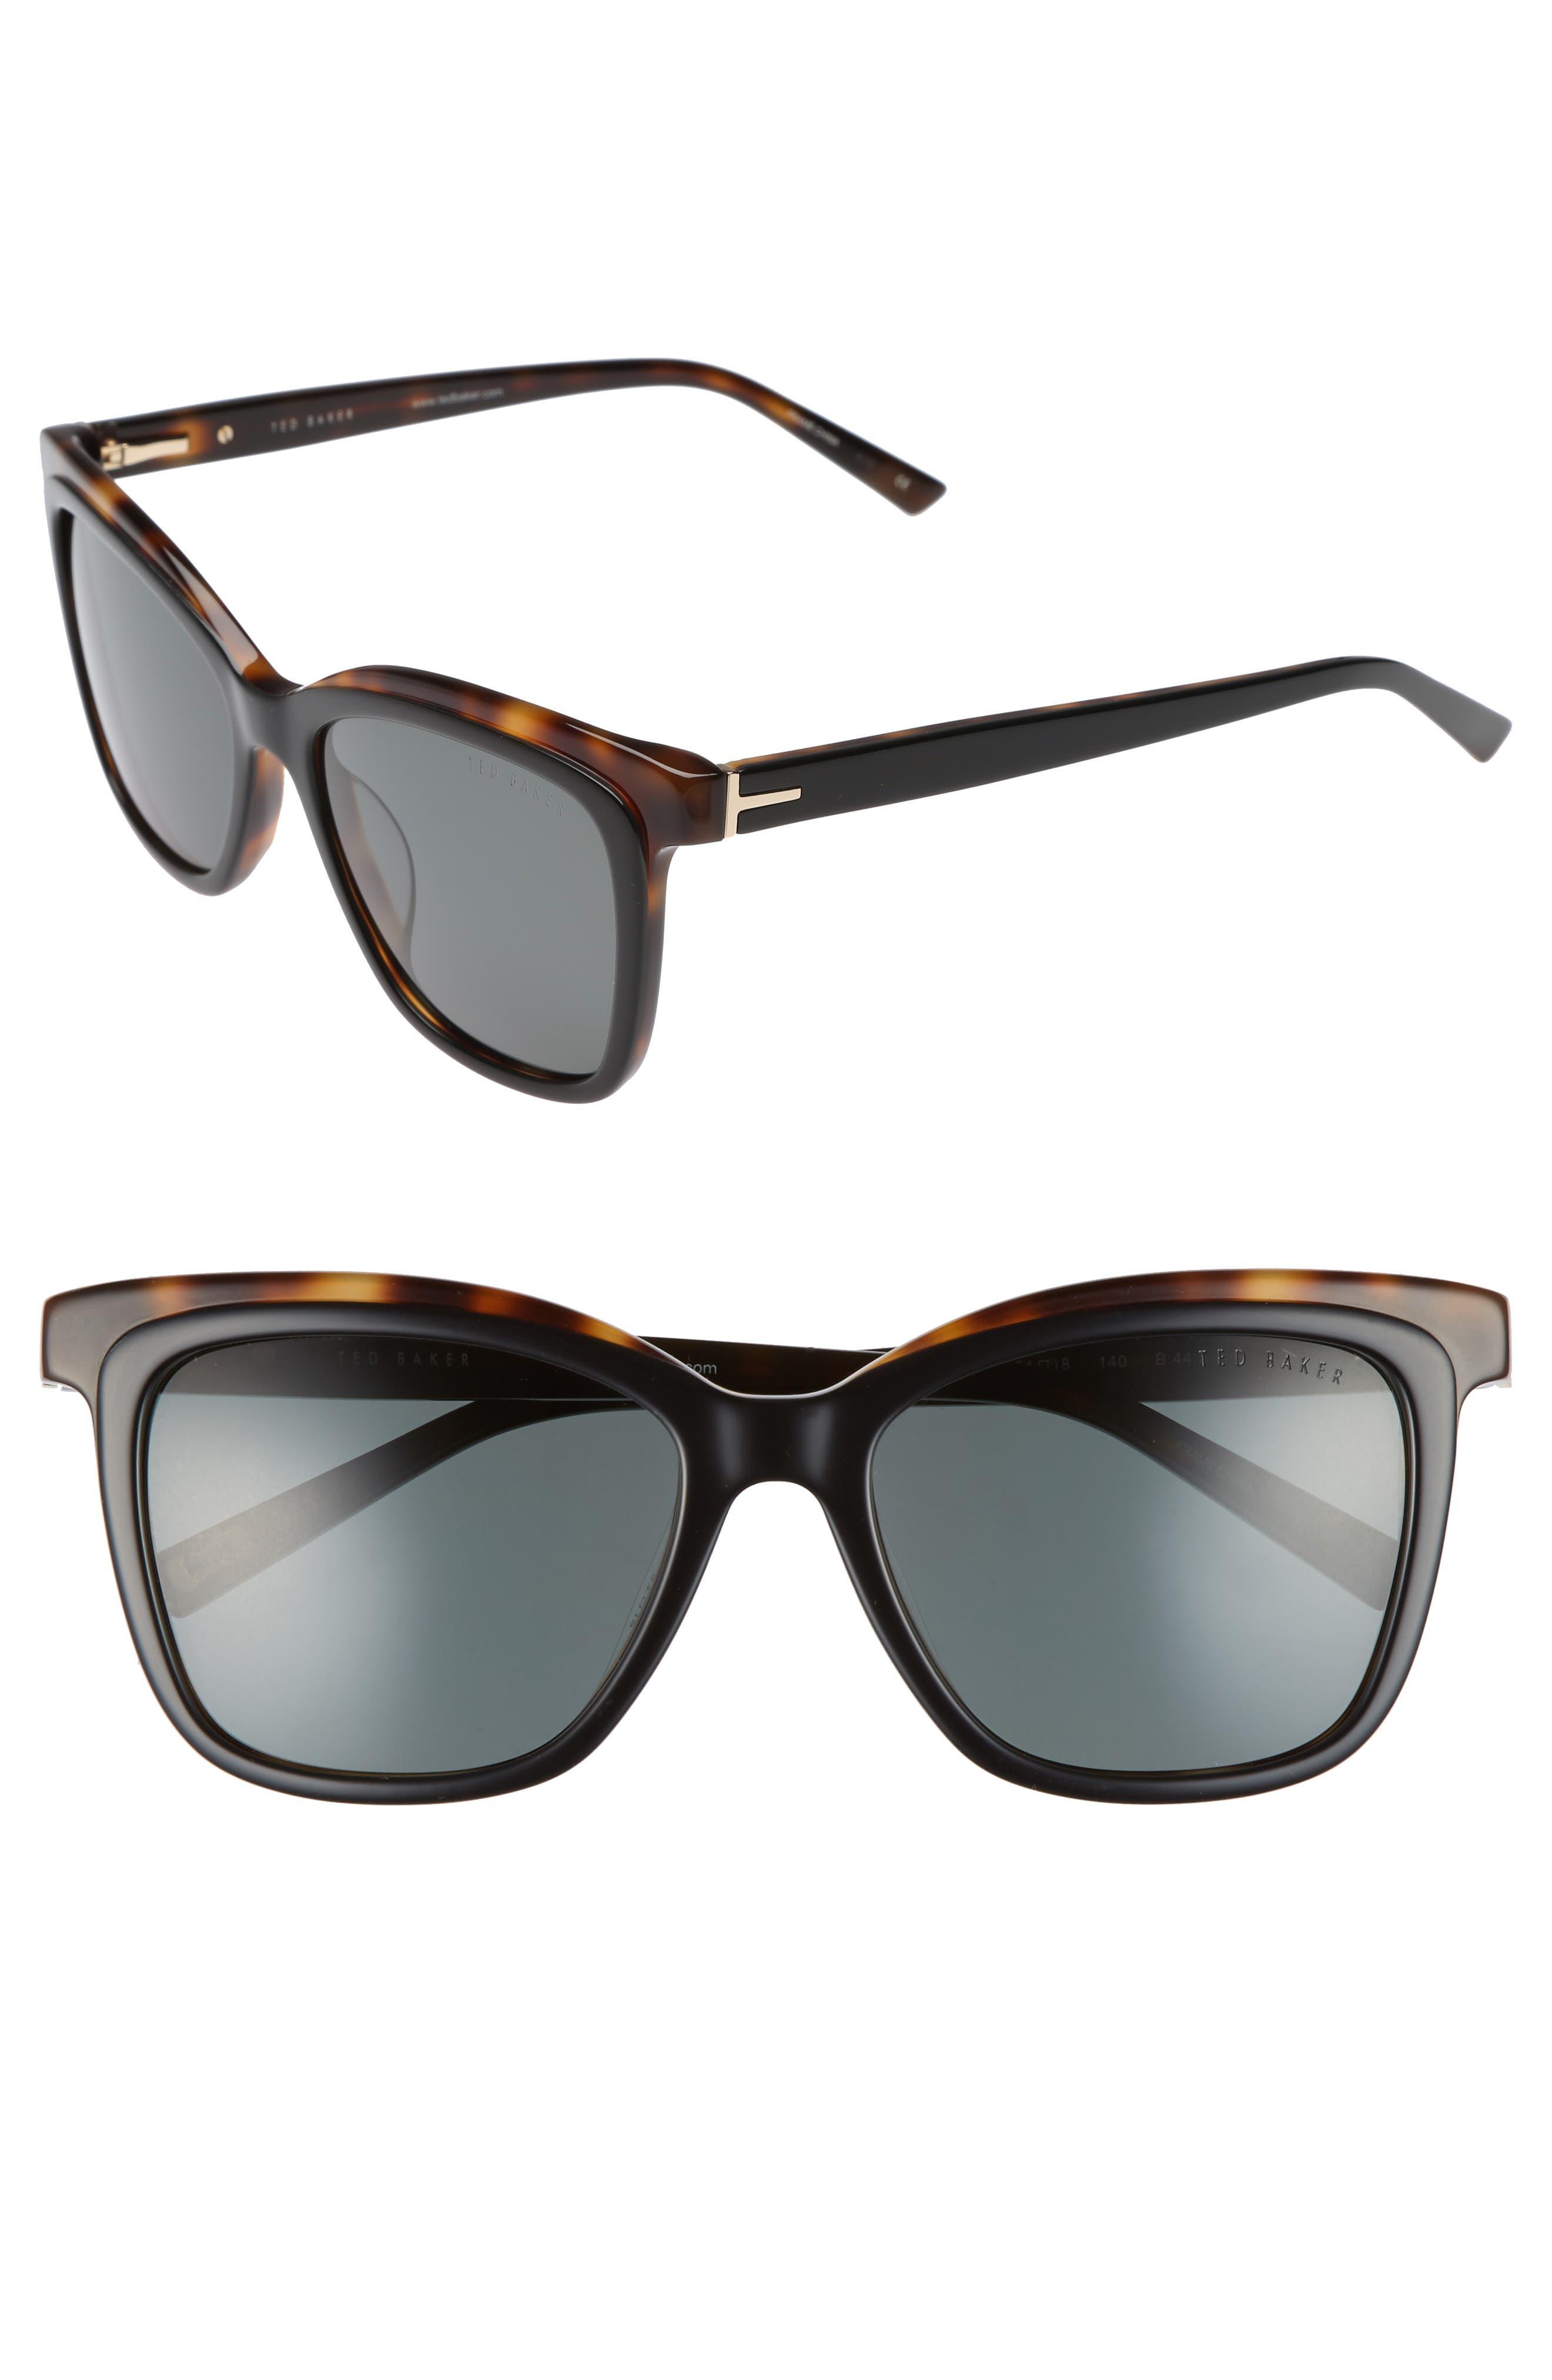 54mm Polarized Cat Eye Sunglasses,                             Main thumbnail 1, color,                             002